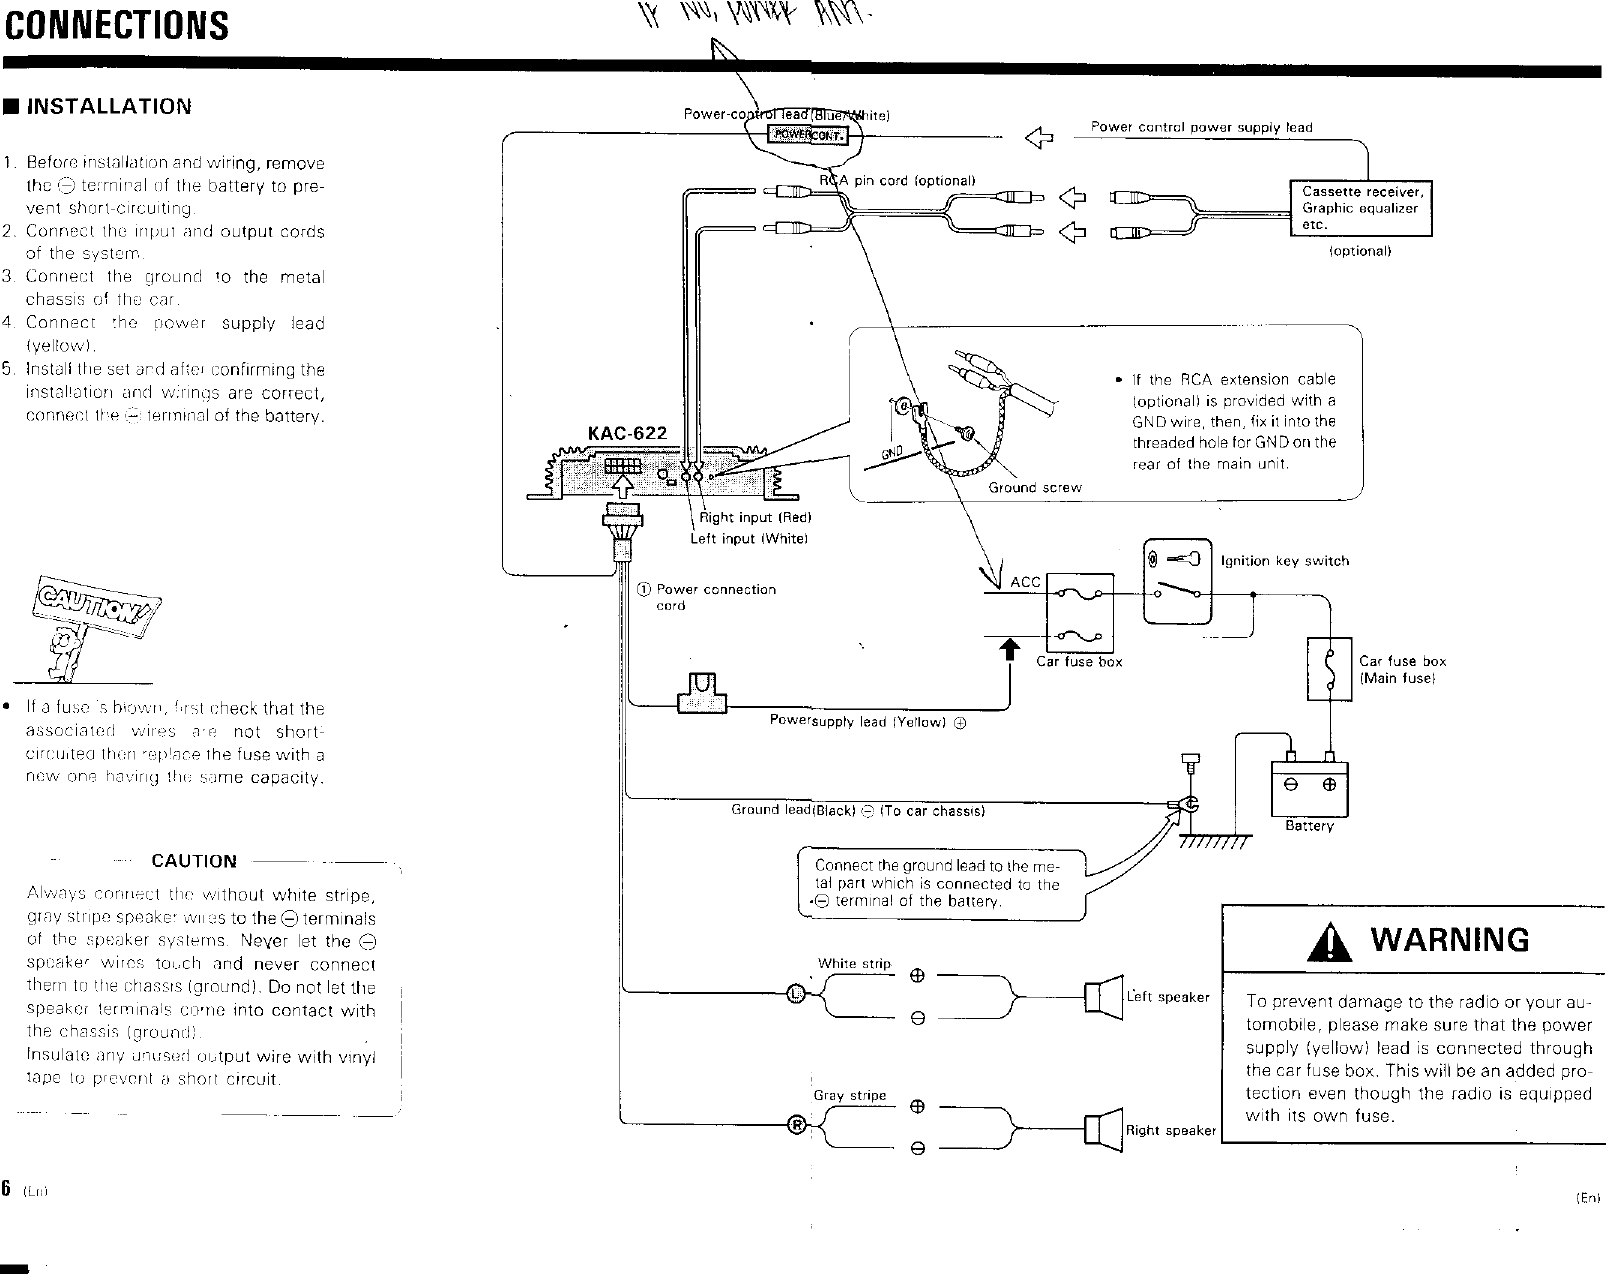 Kenwood Kac 622 Owner S Manual Car Fuse Box Short Page 4 Of 5